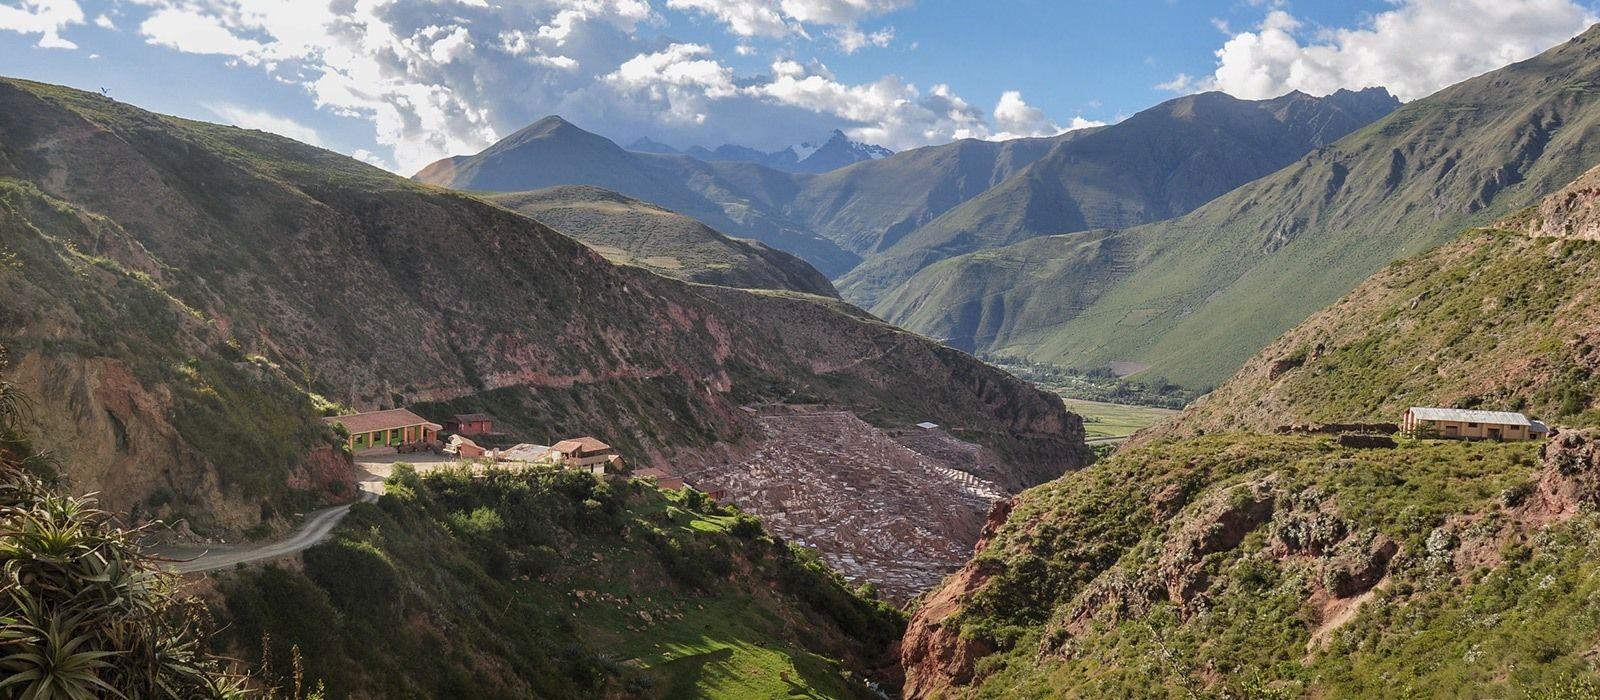 Peru: Highlights of the South Tour Trip 5